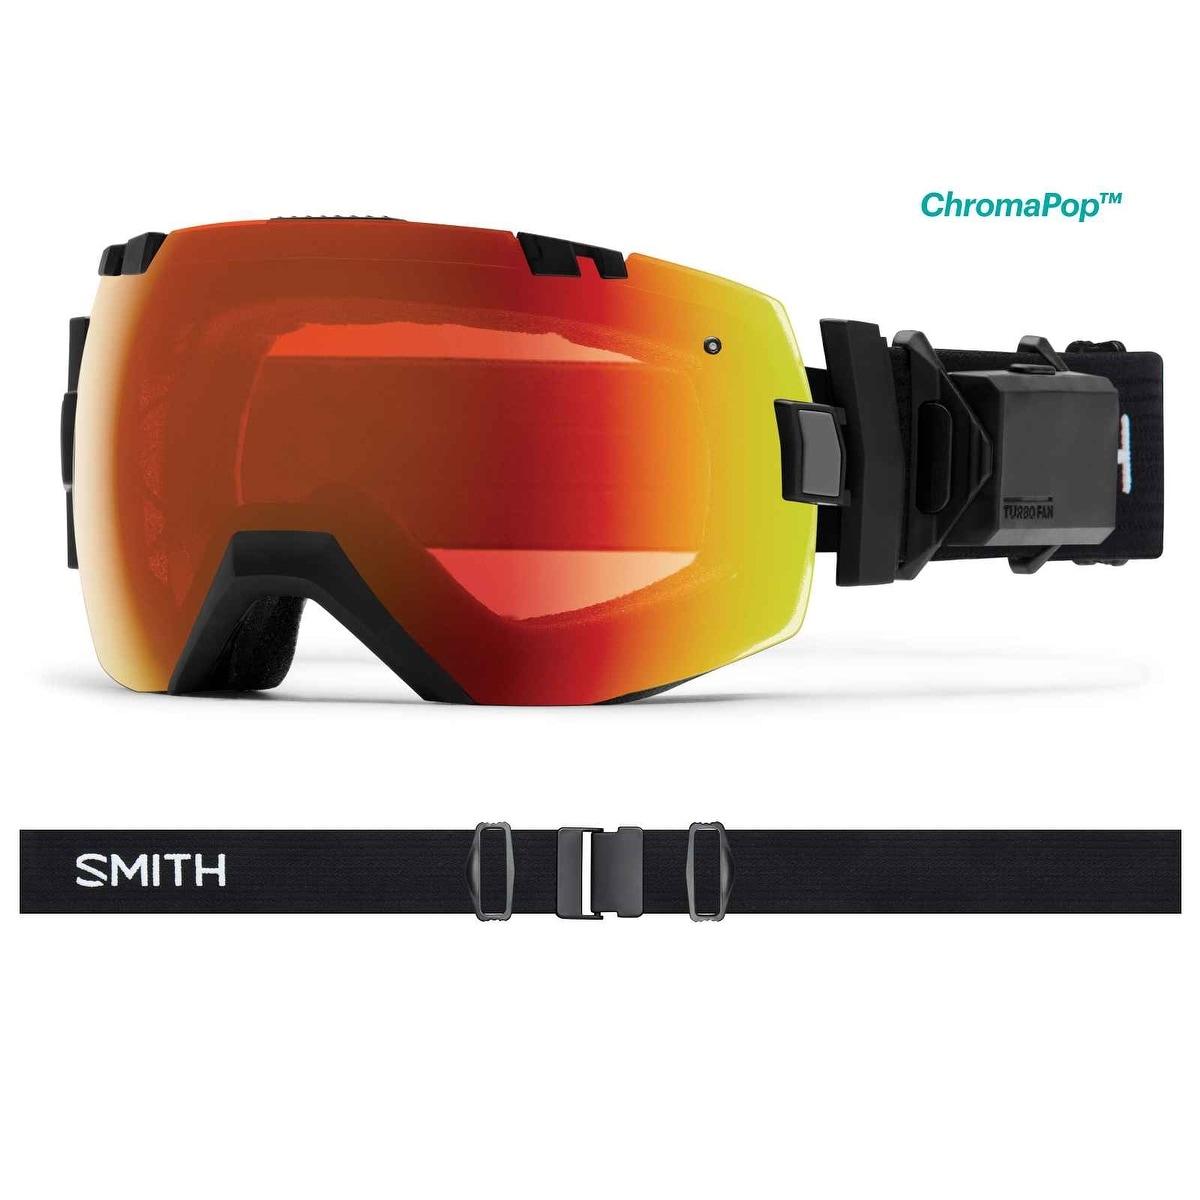 10600aca72 Shop Smith Optics 2017 18 I OX Turbo Fan Goggle - Black Frame ...